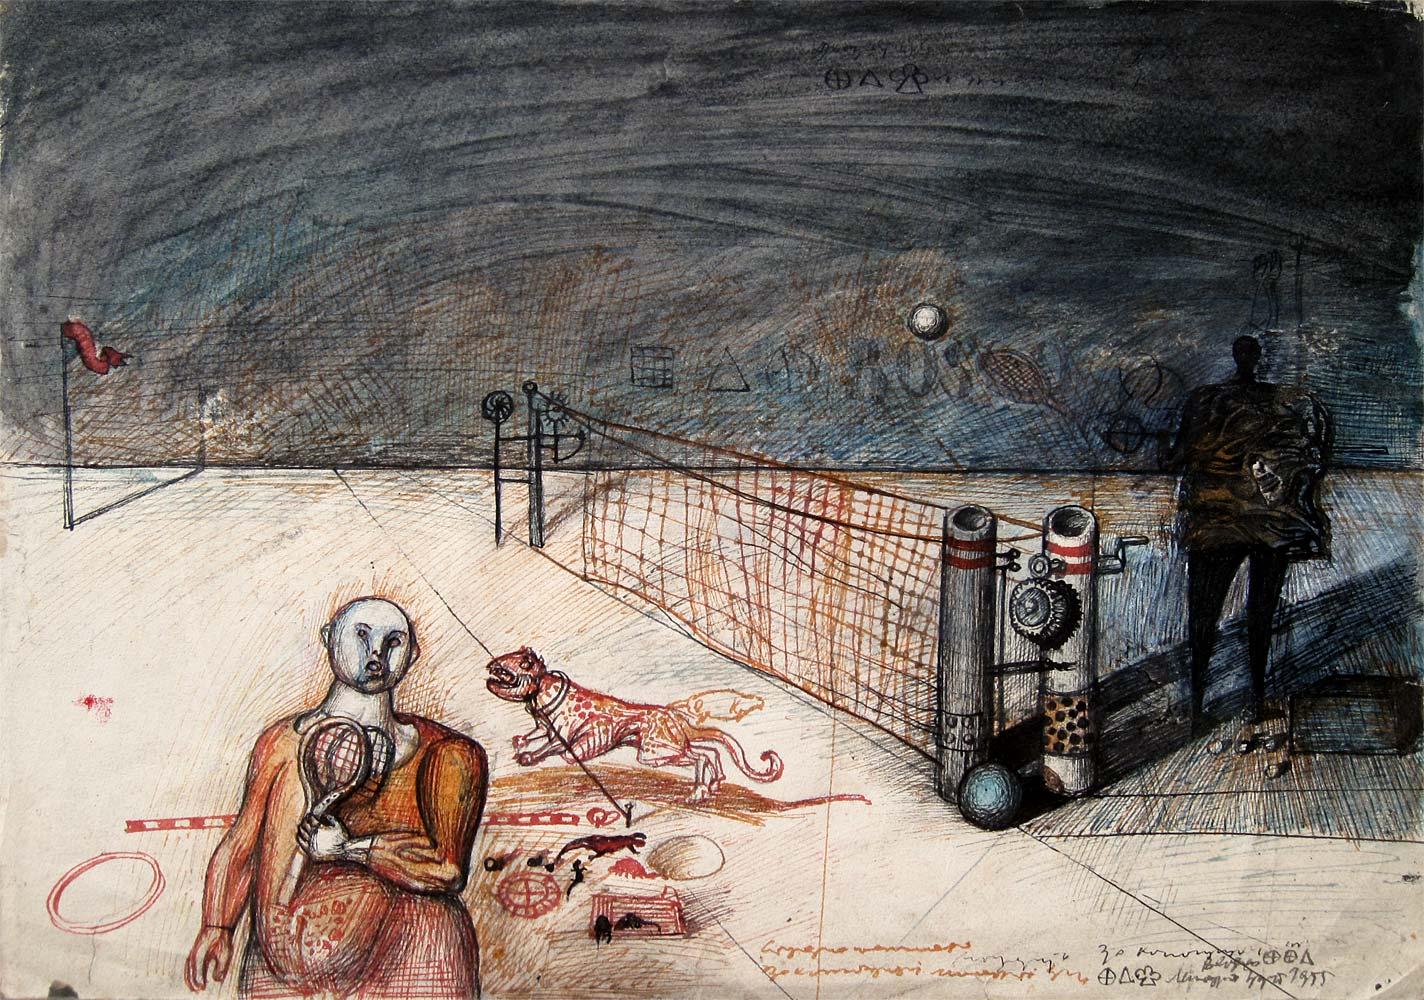 Dado's drawing: Untitled, 1955